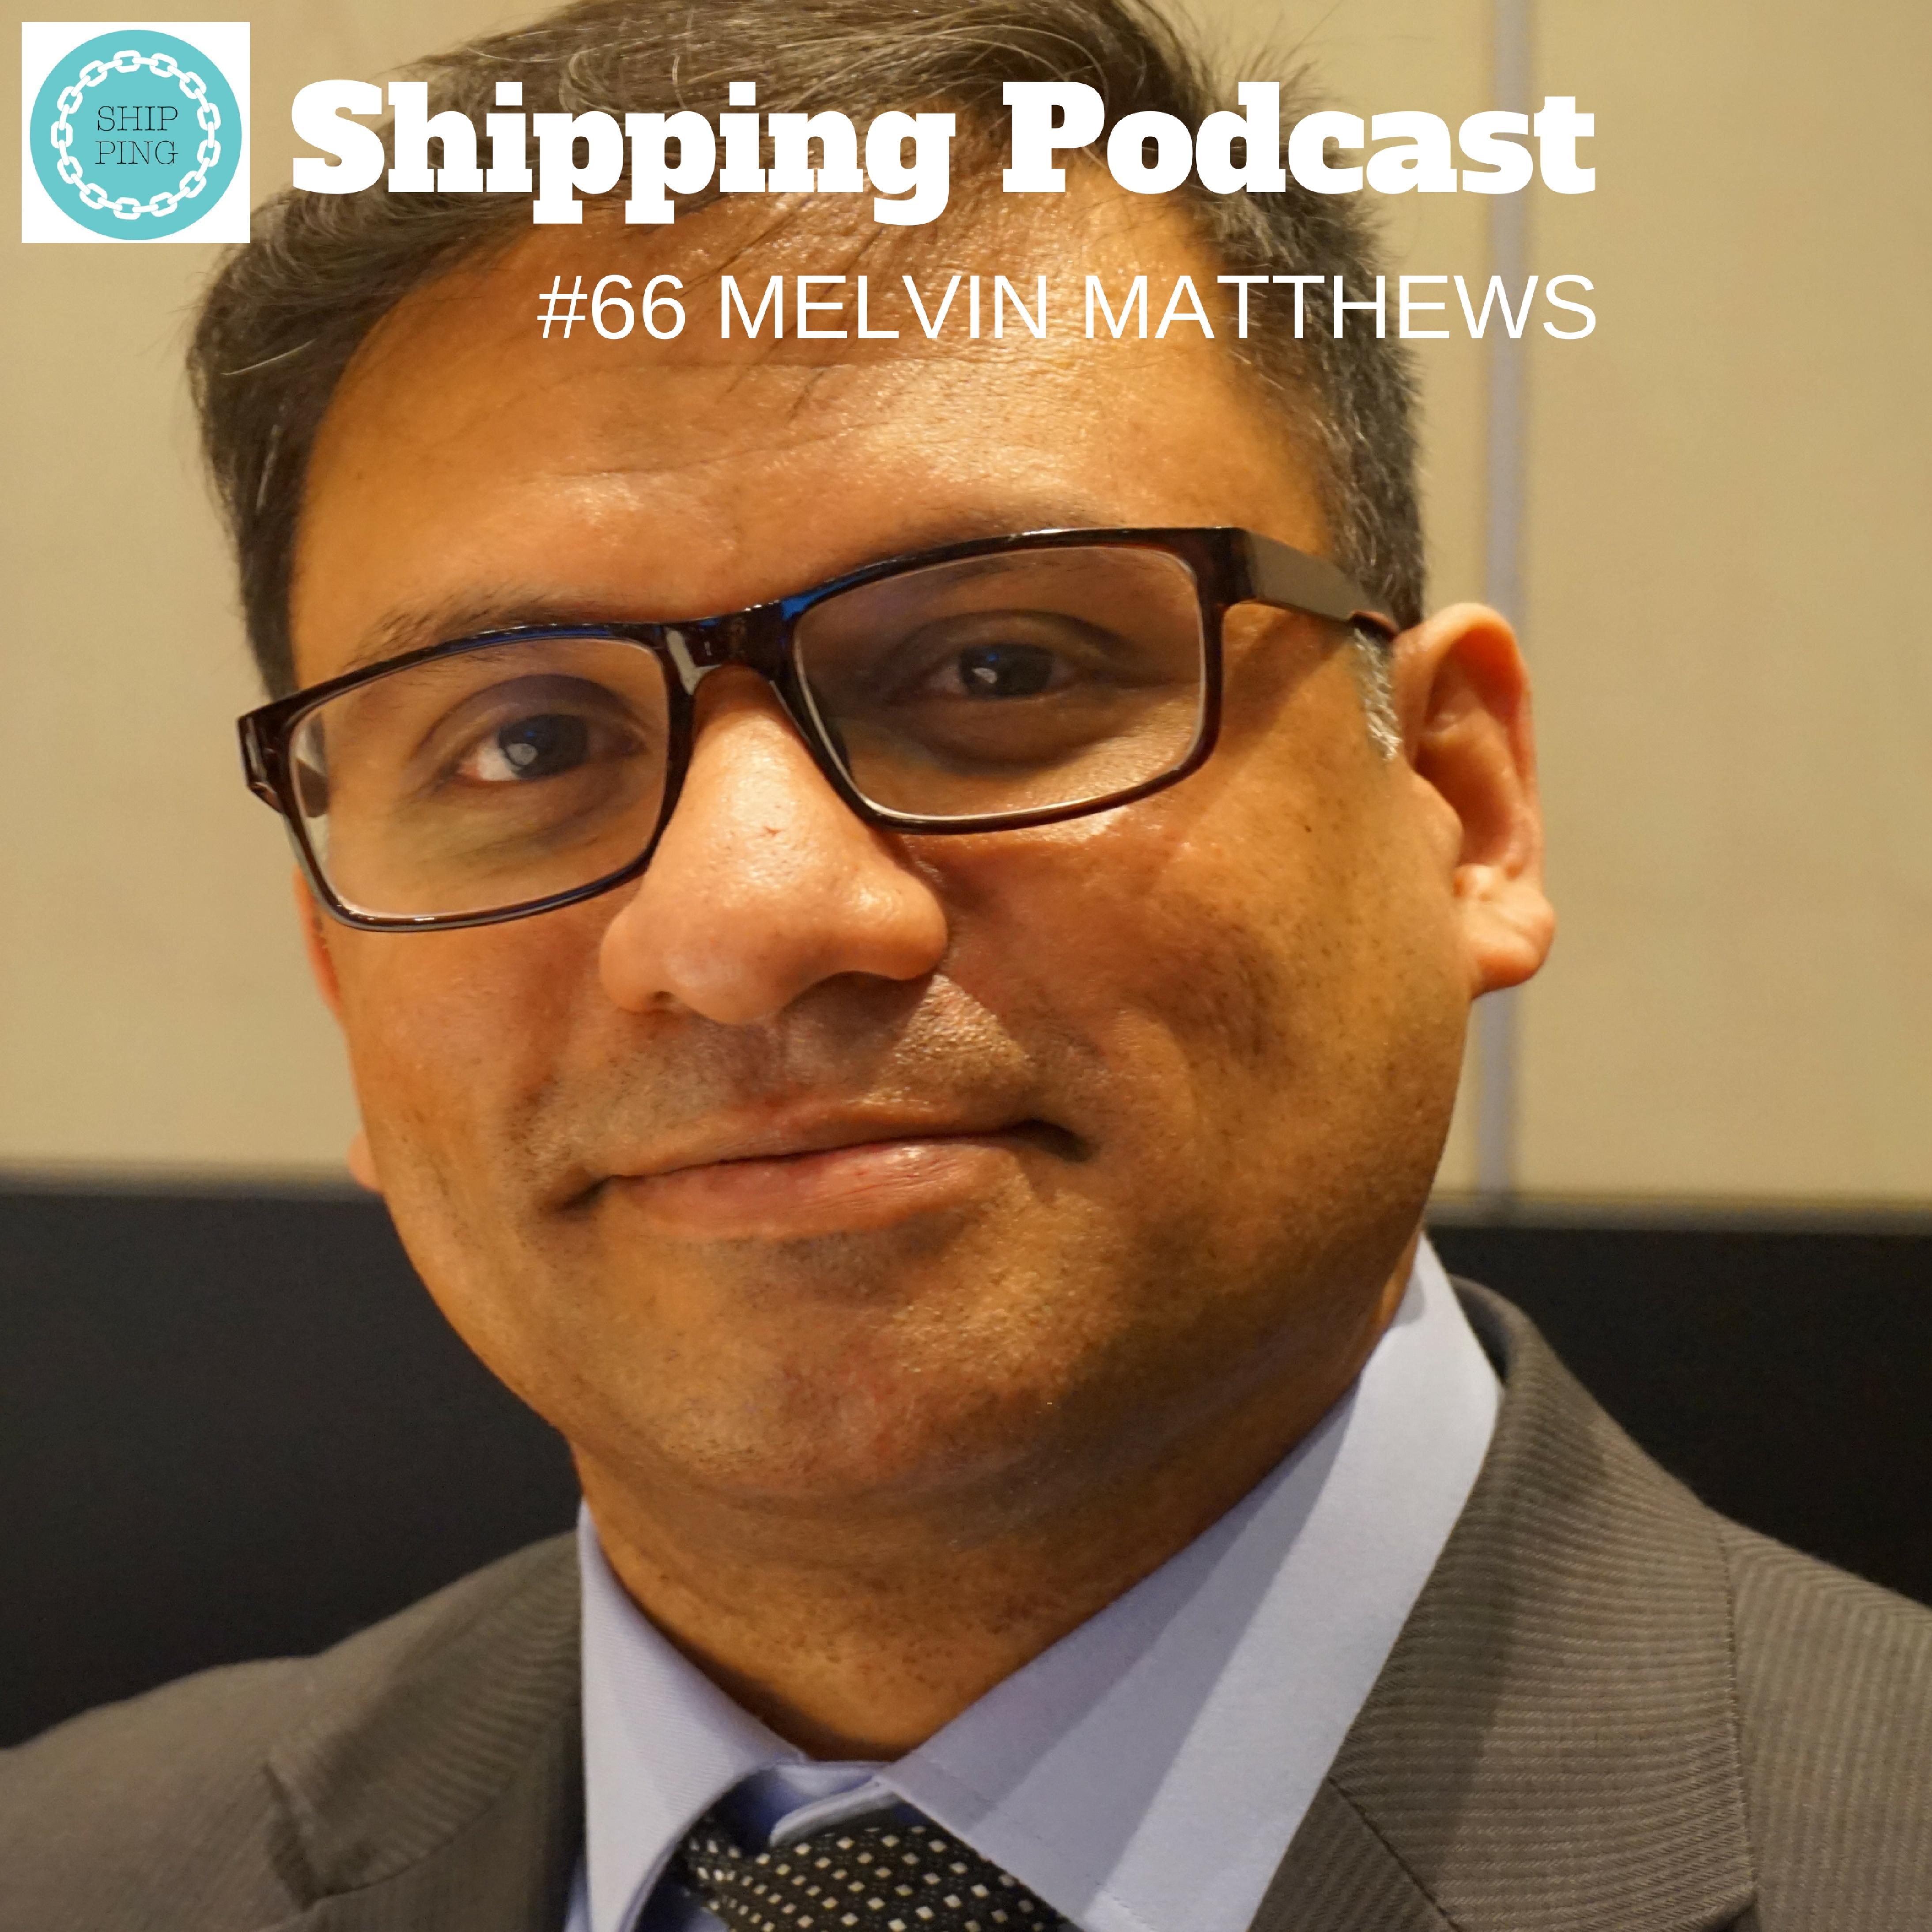 Melvin Matthews